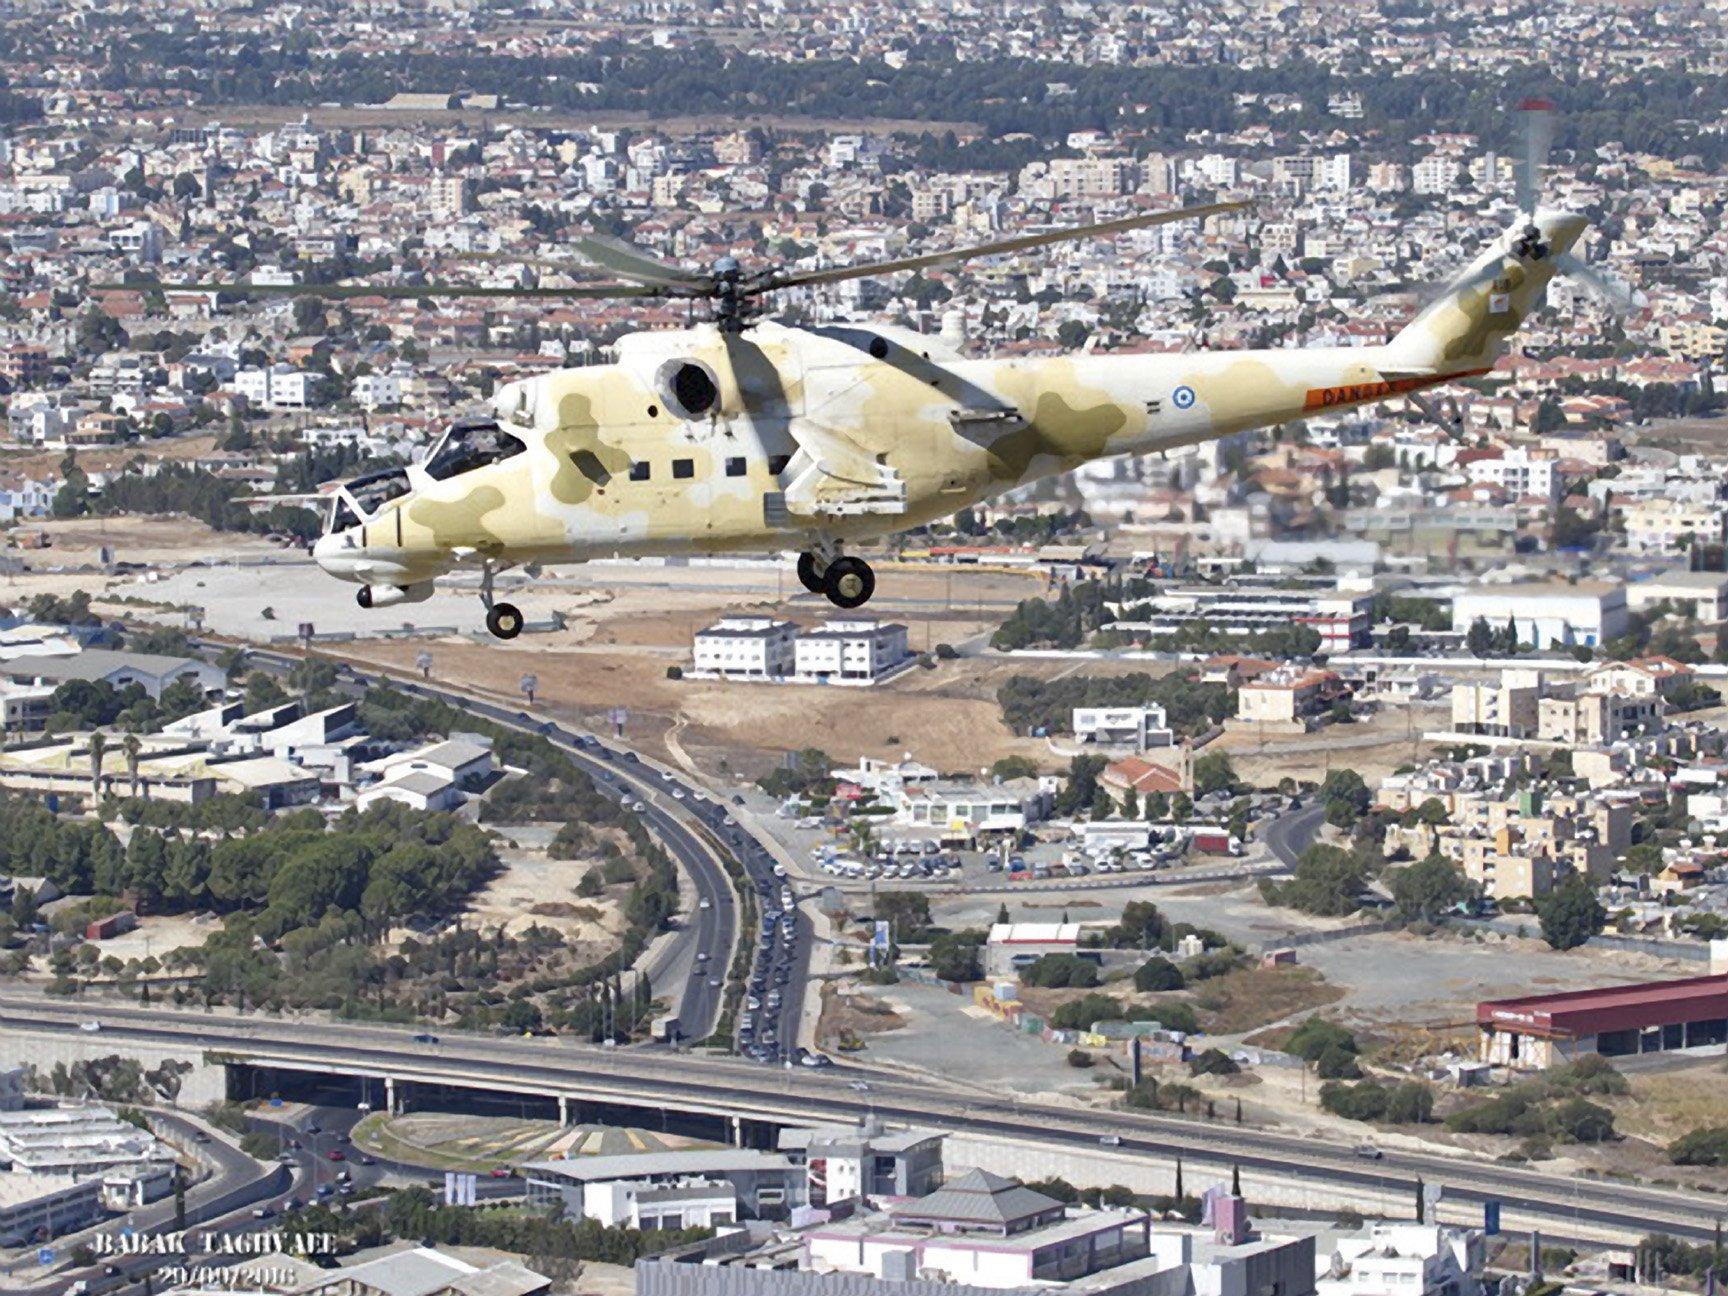 Cypriot National Guard Mi-35P [Babak Taghvaee]